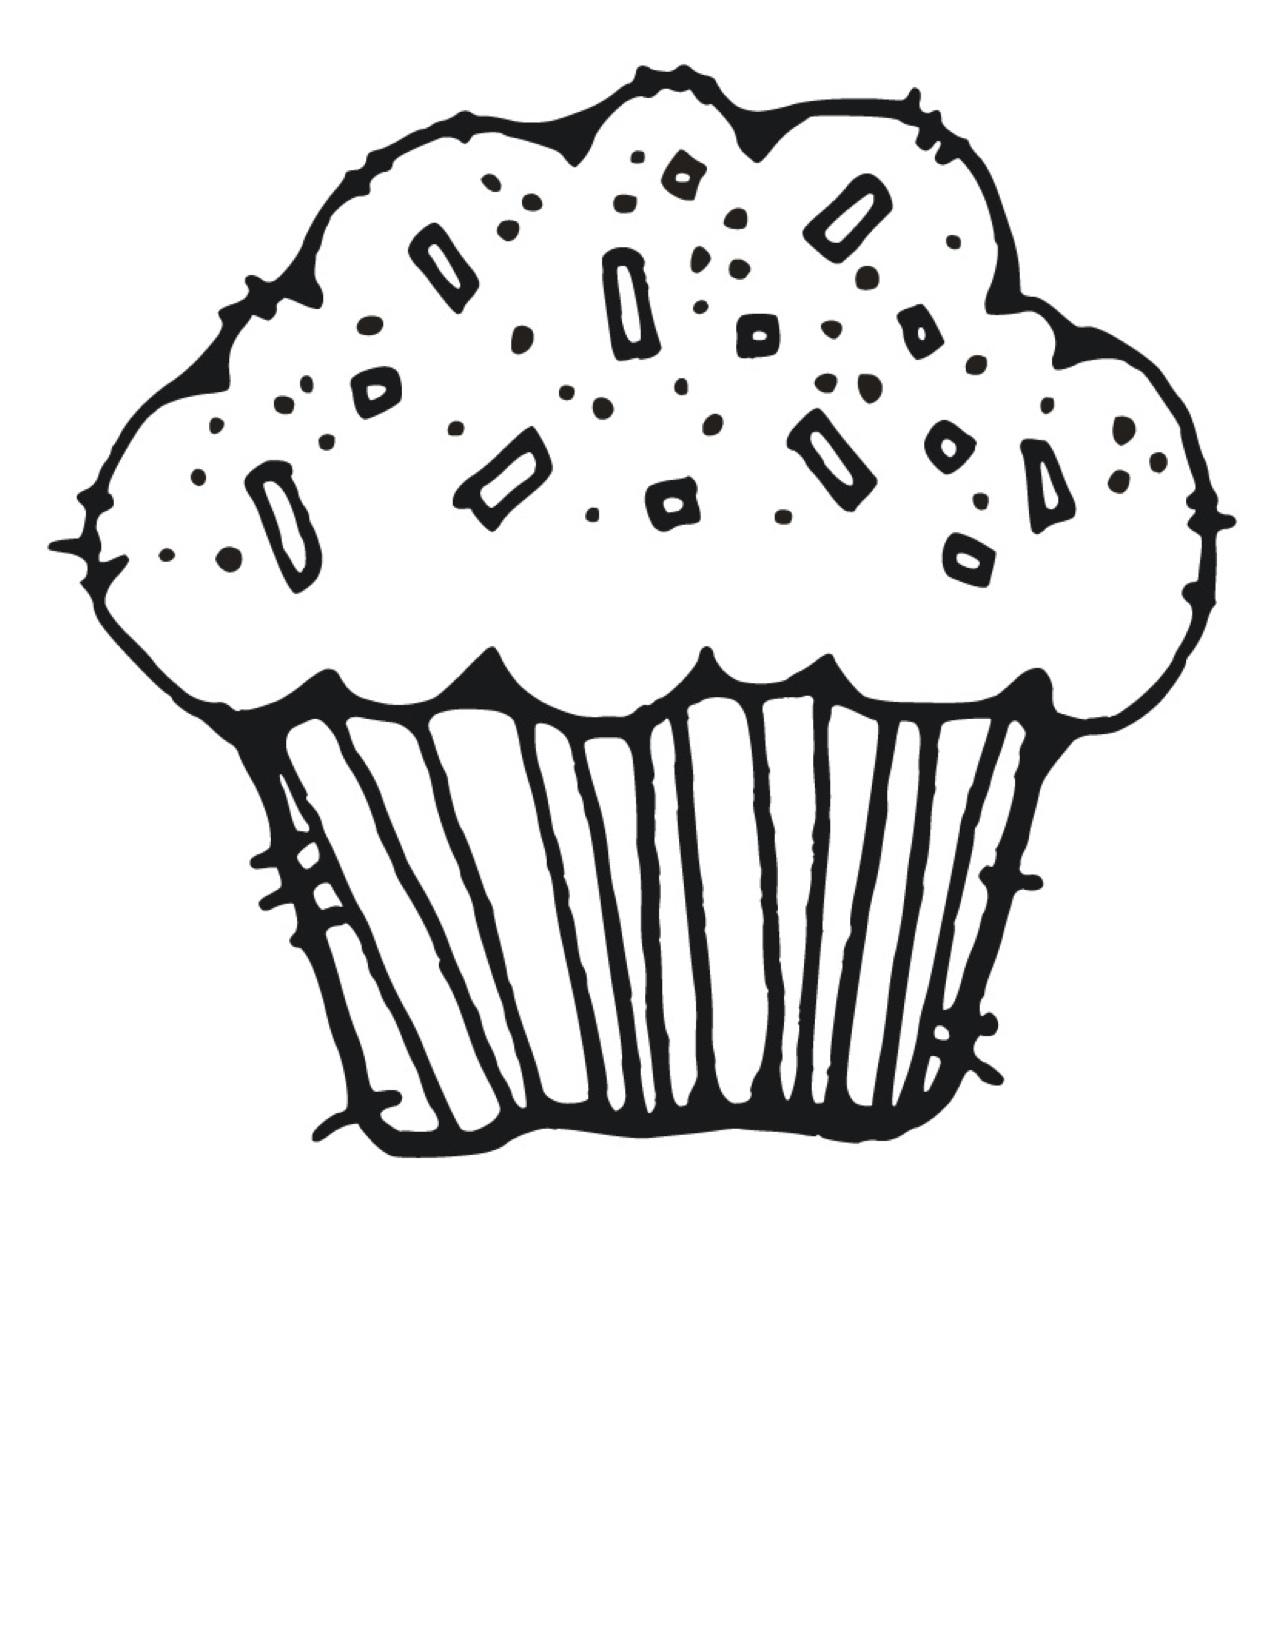 Cupcake Black And White Cute Cupcake Black And White